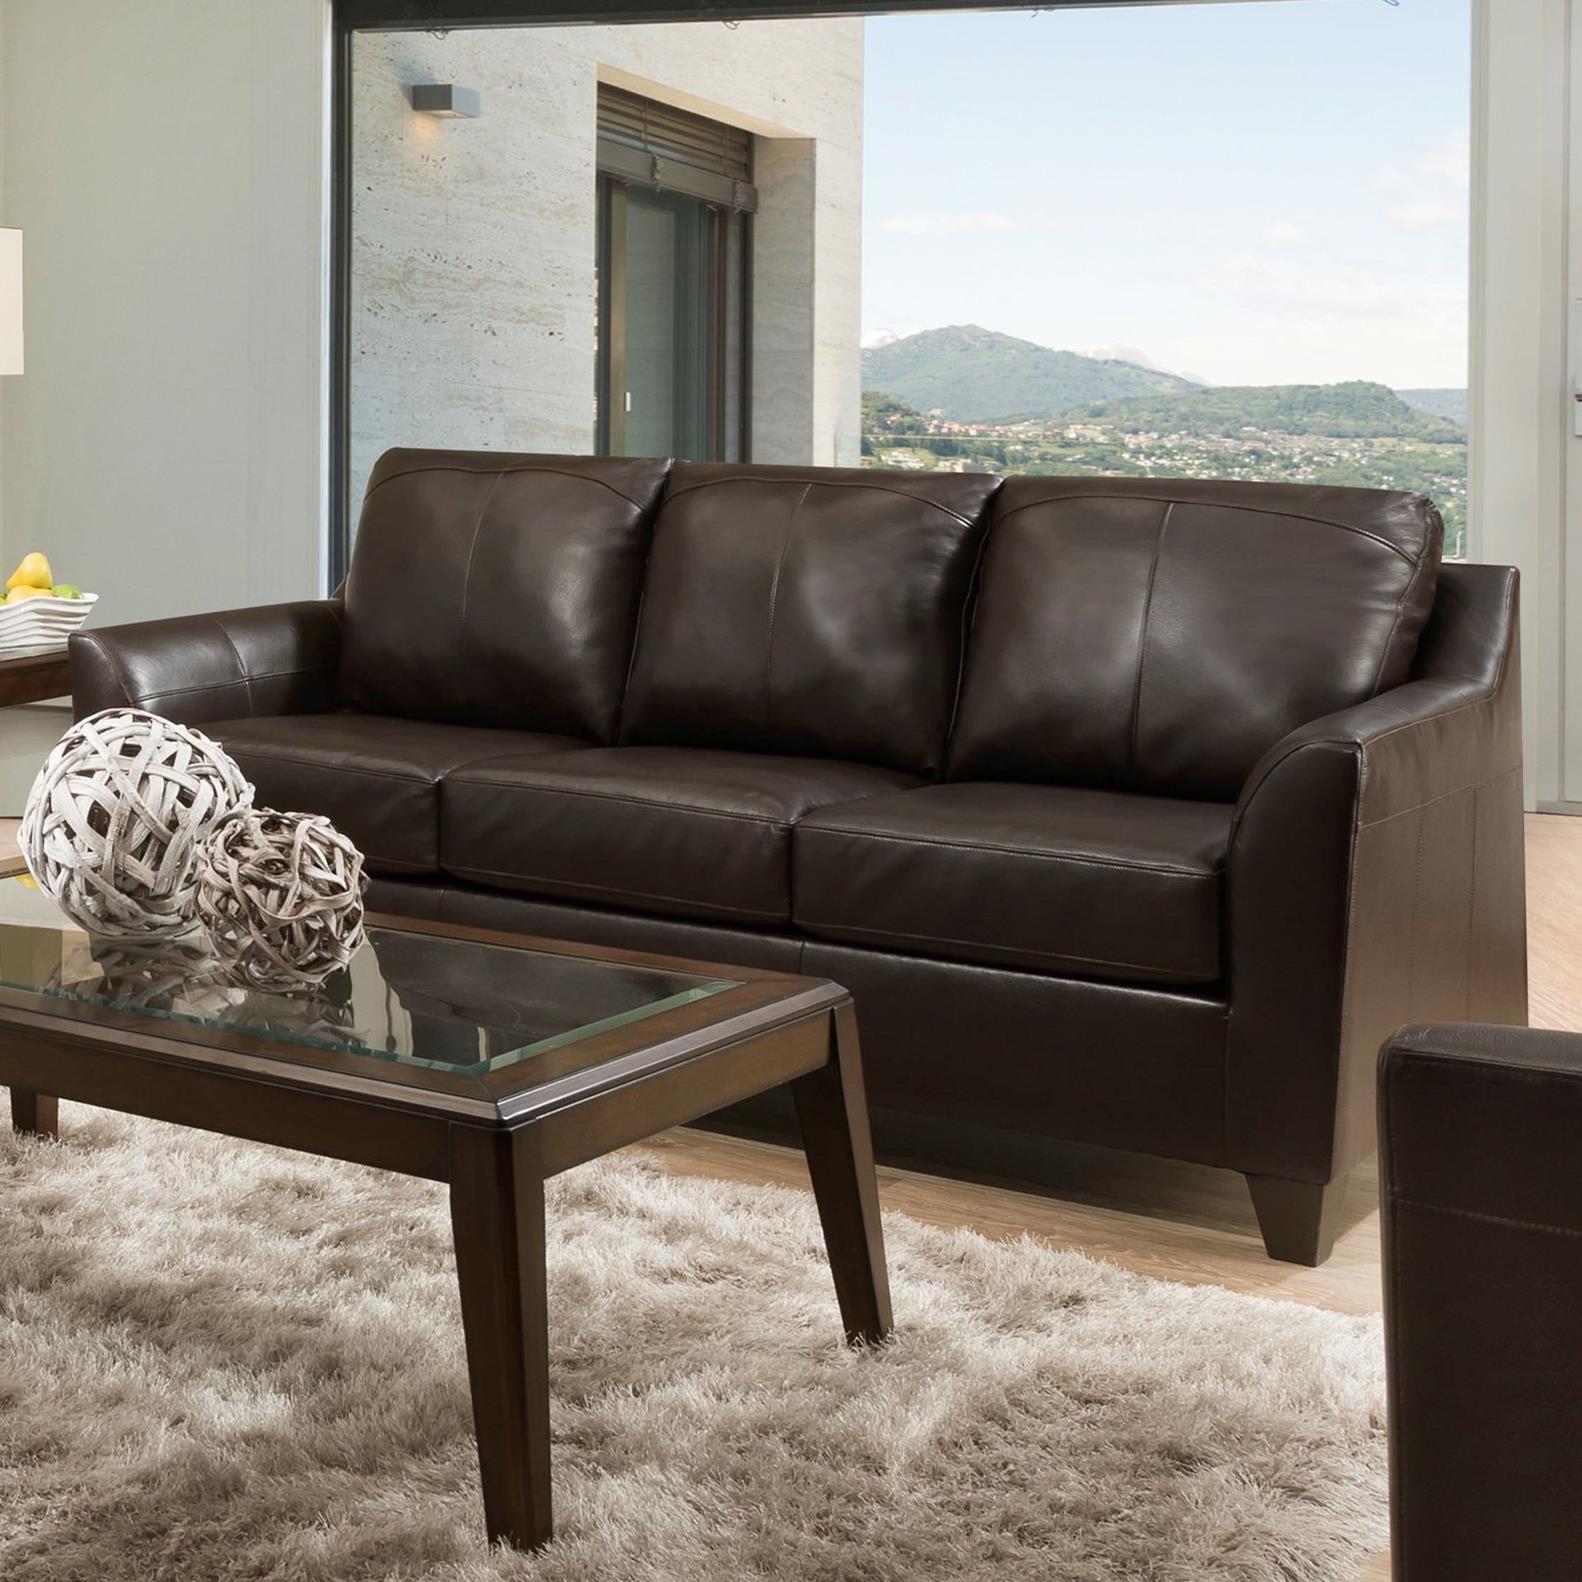 2029 Sofa by Lane at Esprit Decor Home Furnishings